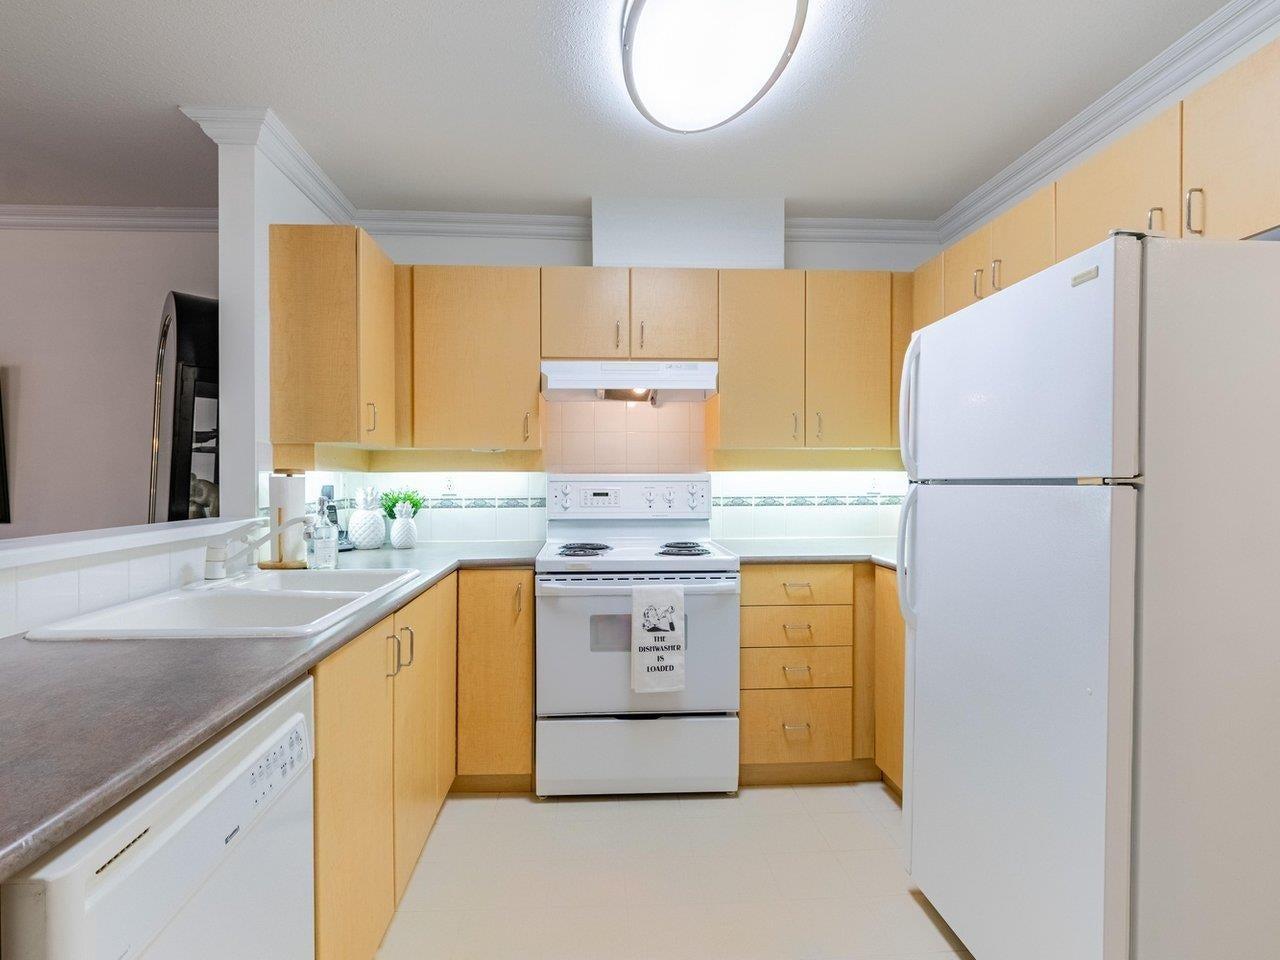 306 15298 20 AVENUE - King George Corridor Apartment/Condo for sale, 2 Bedrooms (R2625551) - #7